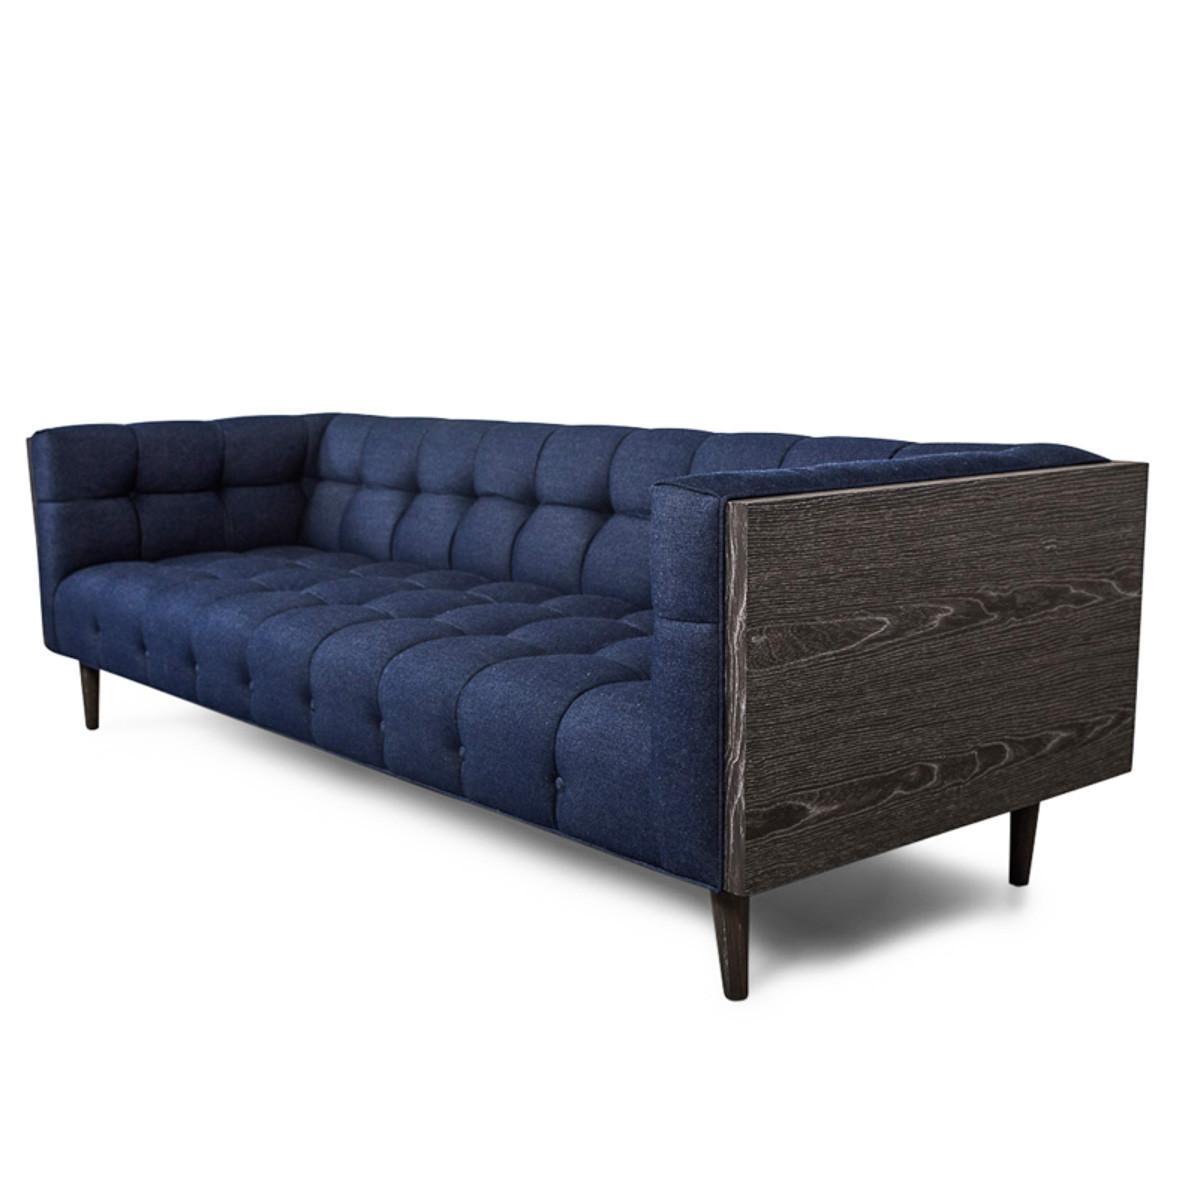 Sofas: Mid Century Settee | Mid Century Sofas | Cheap Mid Century With Regard To Cheap Retro Sofas (Image 11 of 20)